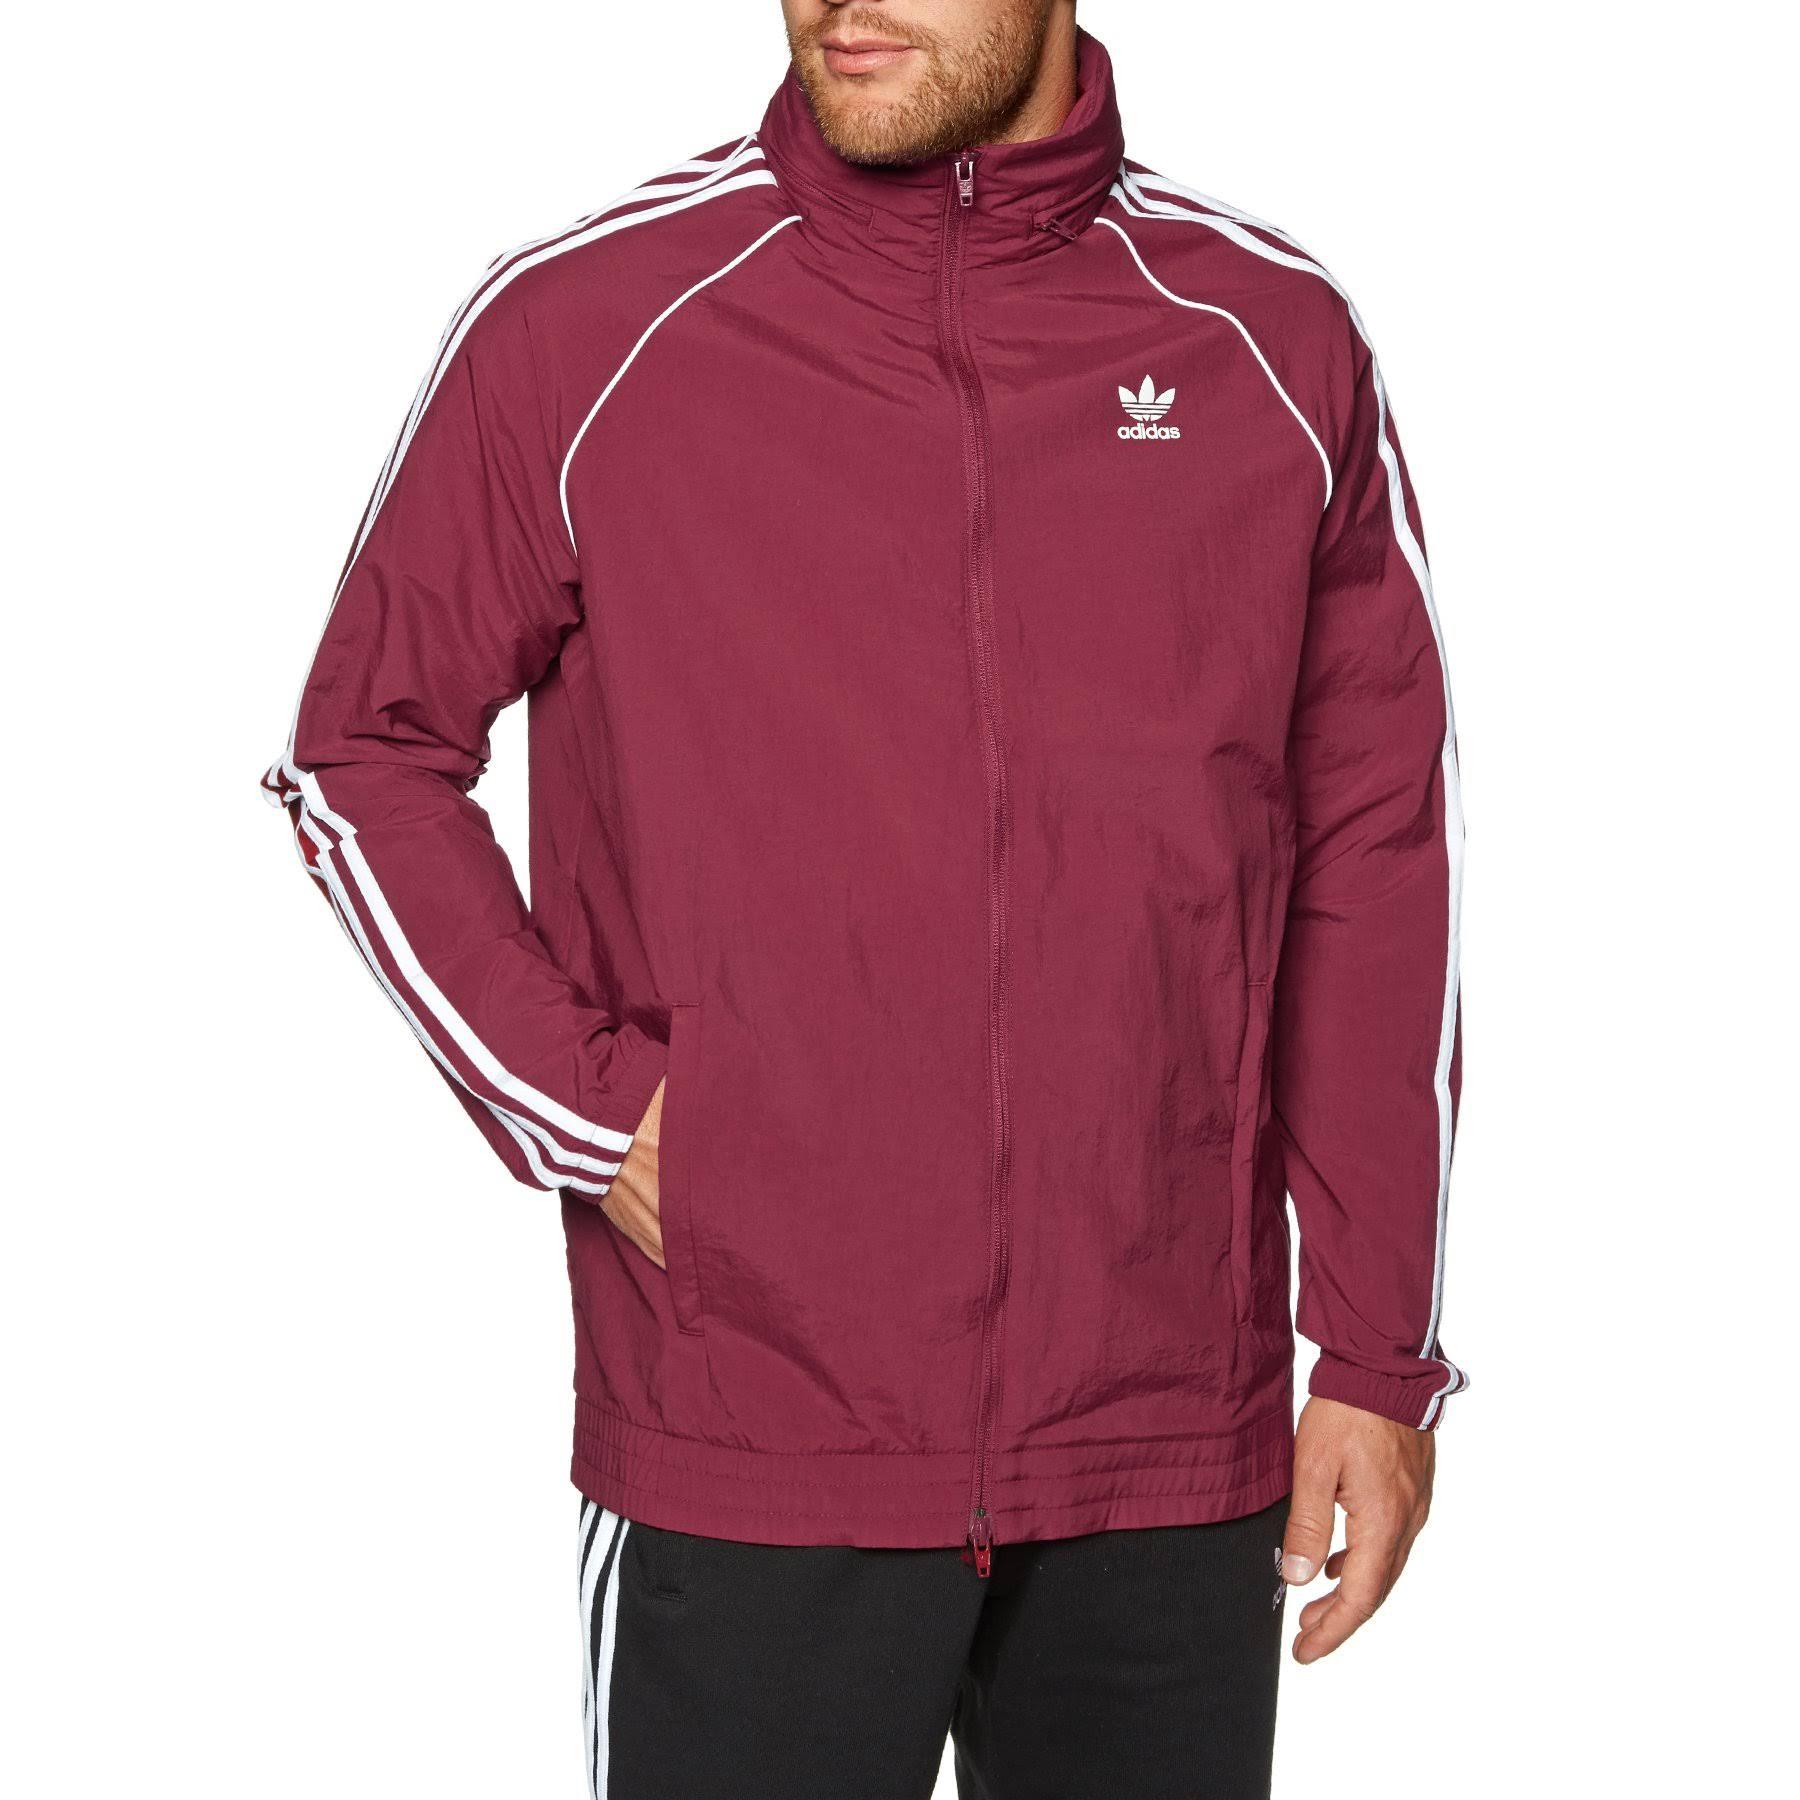 Windbreaker Burgandy Collegiate Burgundy Herren Sst L Adidas aqRxwZ5Z8